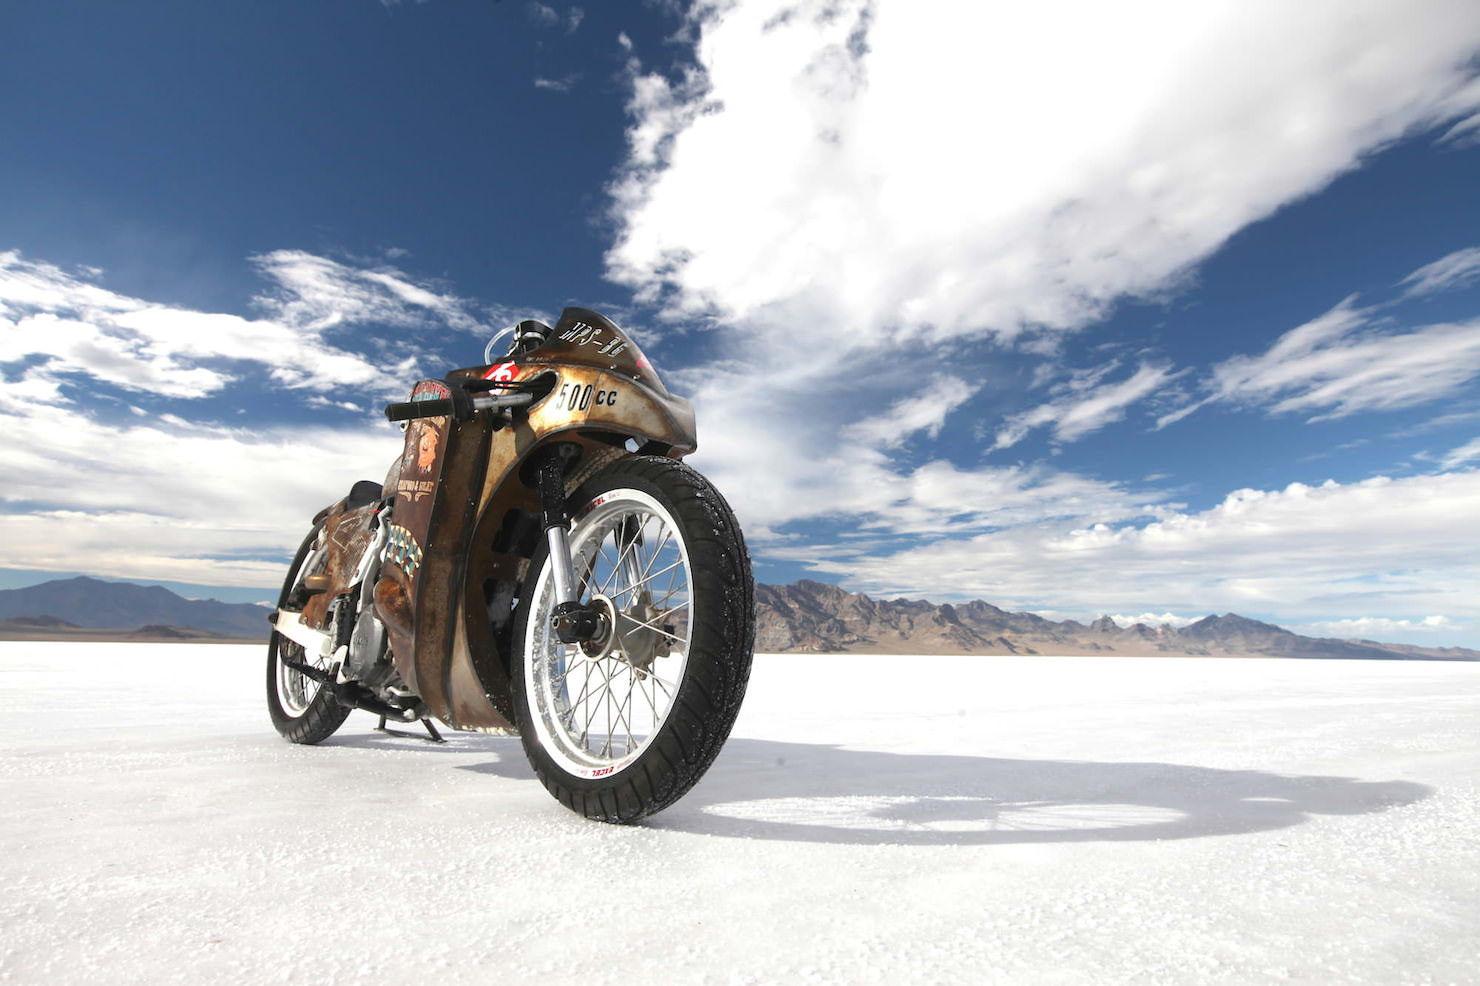 Turbo Yamaha Salt Flat Racer by Super Rat 5